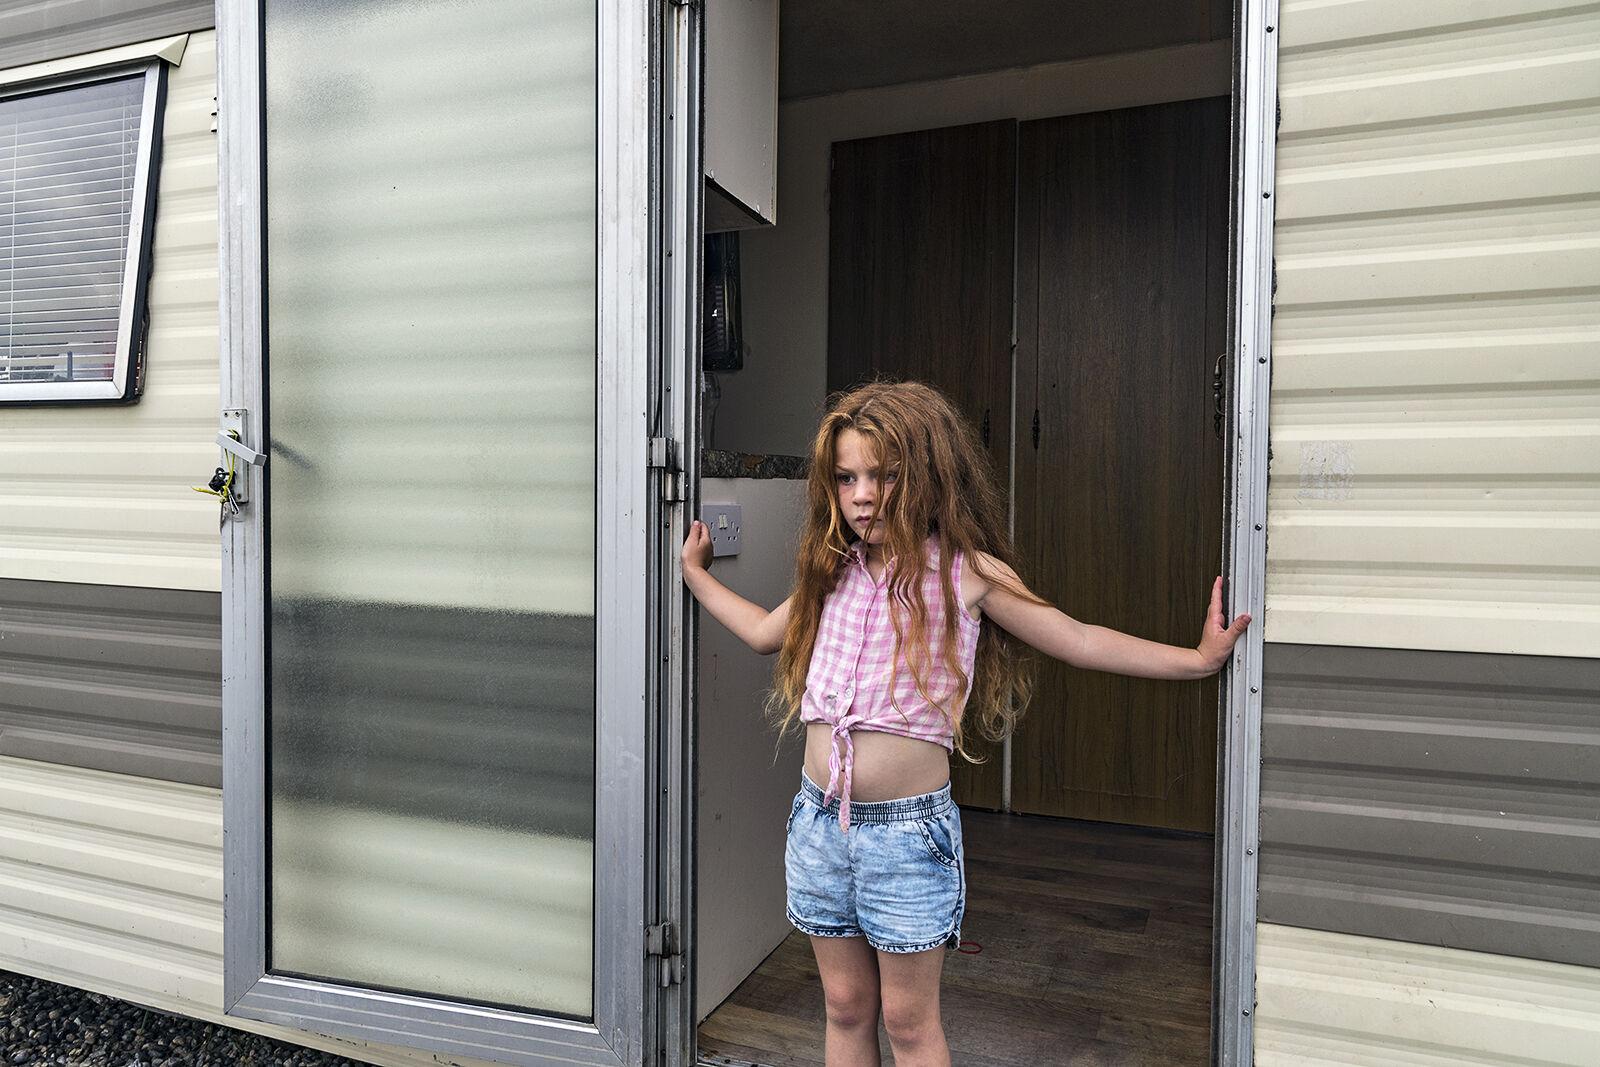 Maggie at The Door, Tipperary, Ireland 2020